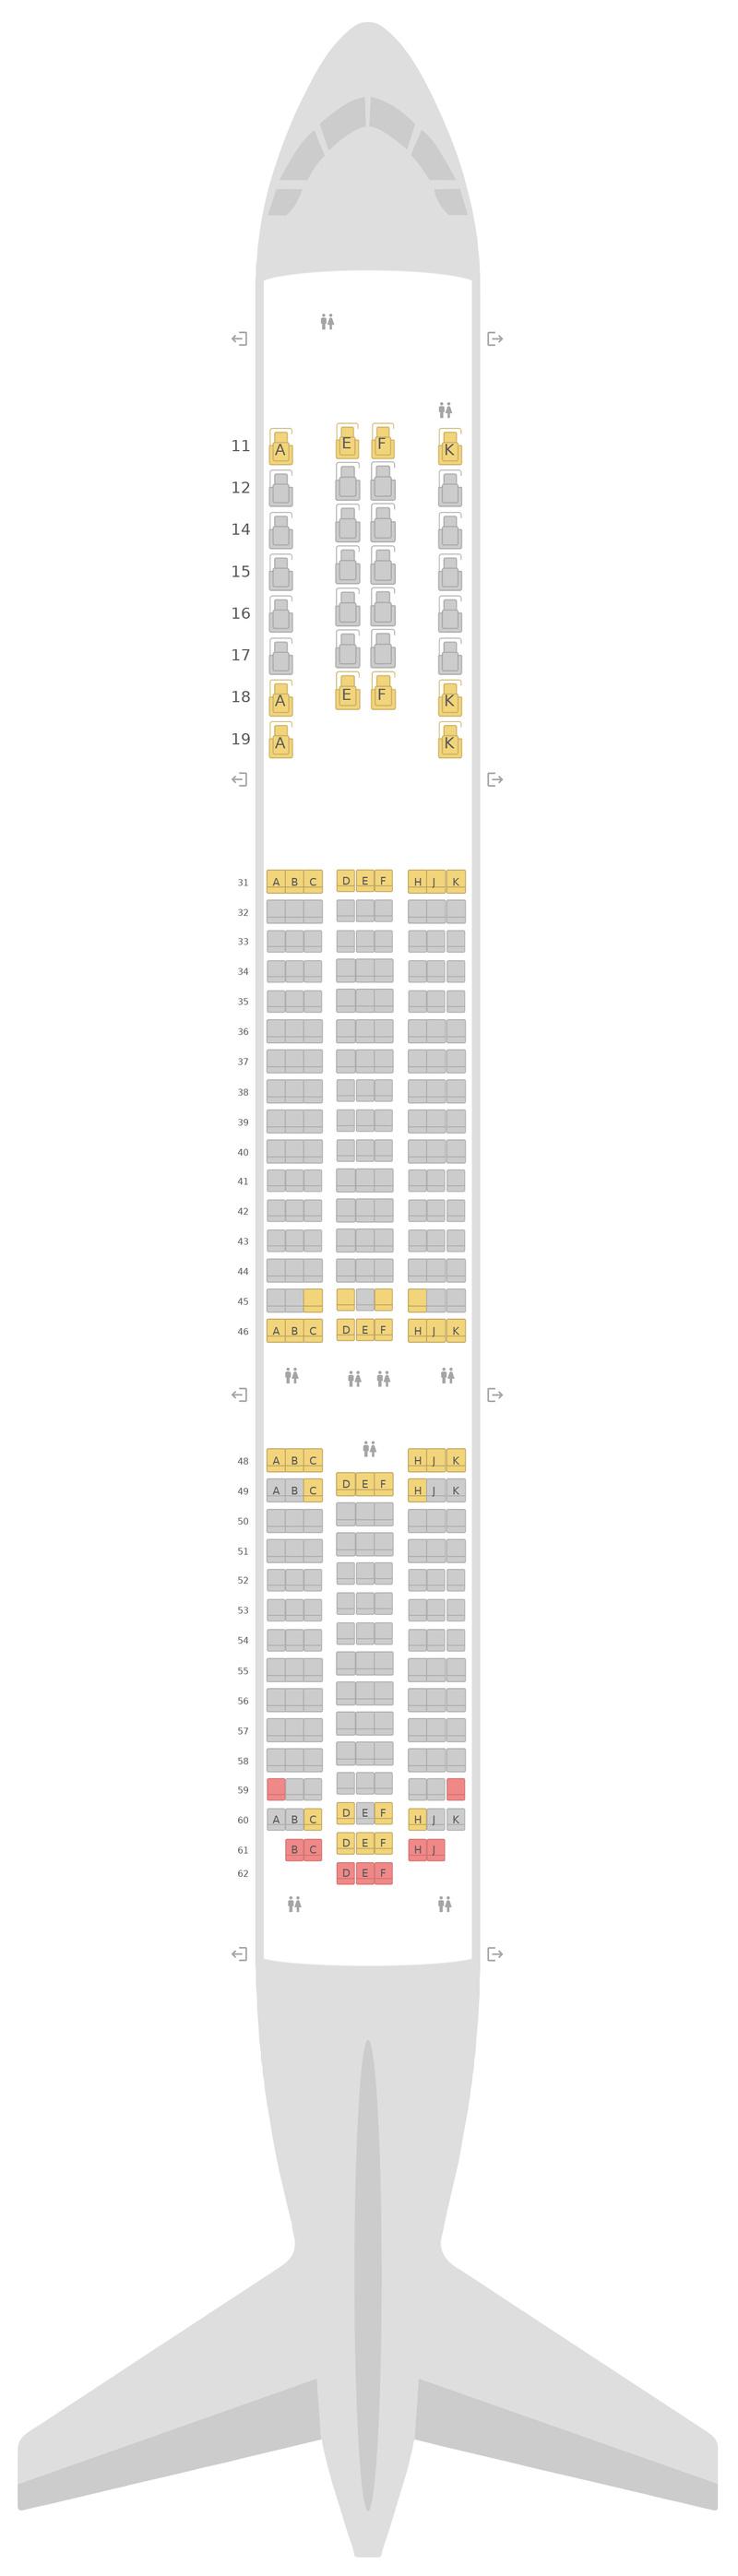 Схема салона Боинг 787-9 (789) Тайские авиалинии